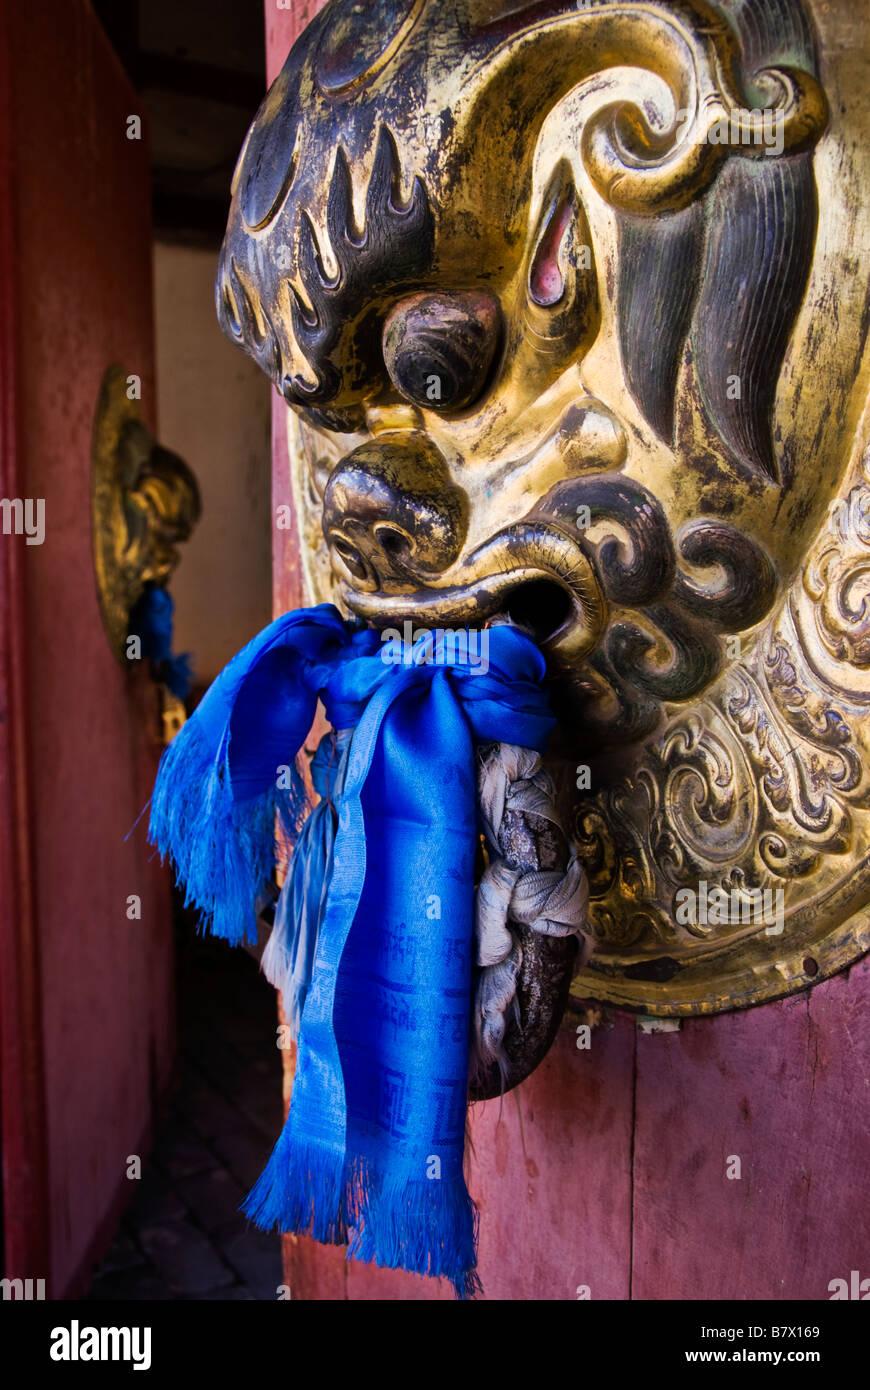 Door handle at Erdene Zuu Khiid monastery Kharkhorin Karakorum Mongolia - Stock Image